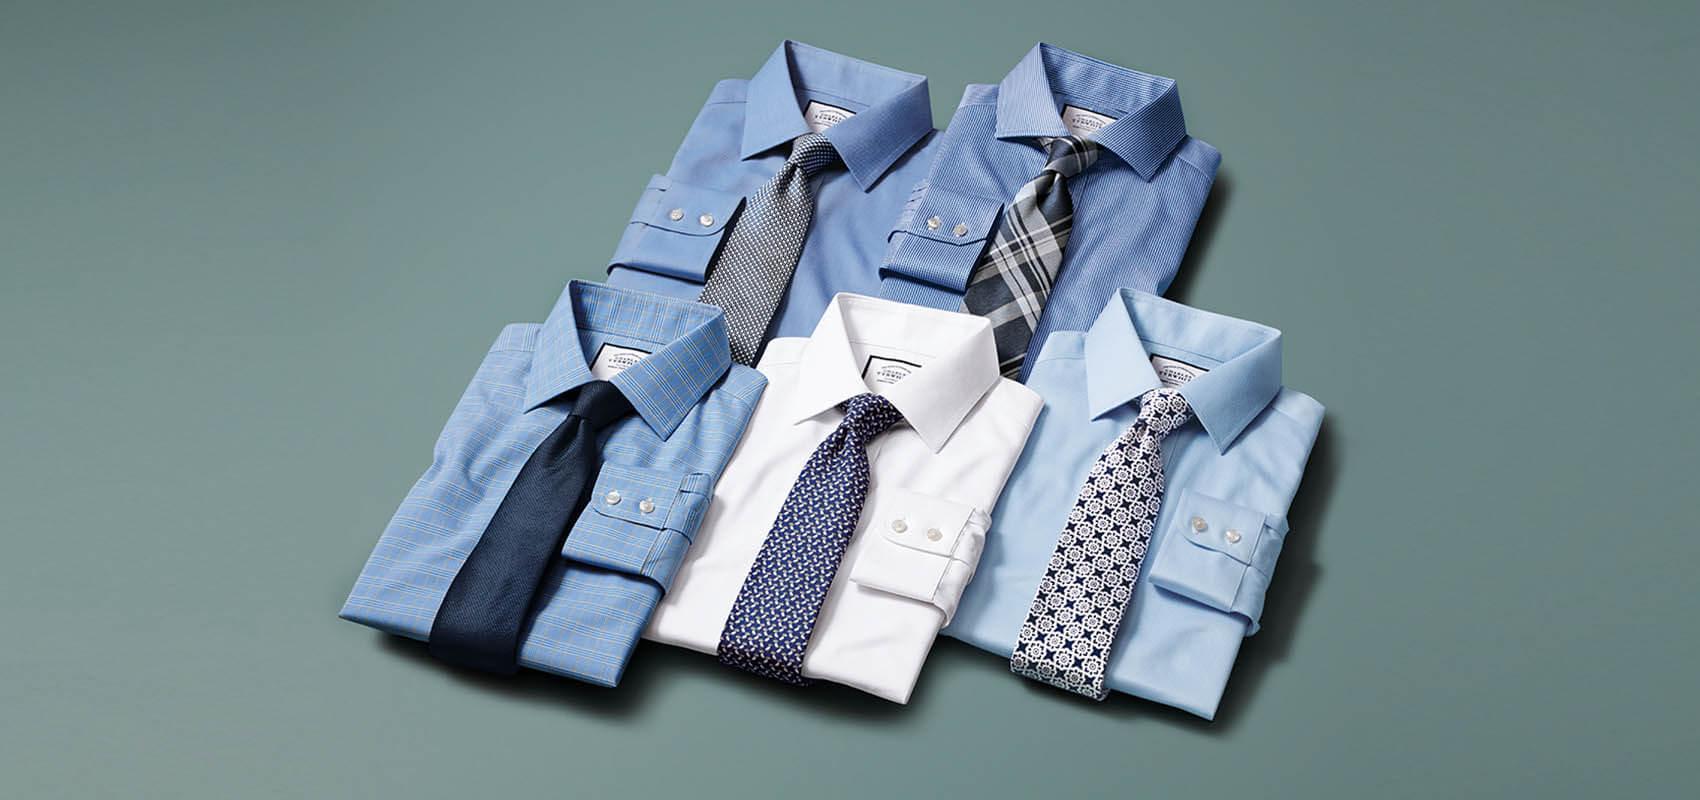 Charles Tyrwhitt Men's non-iron white and blue shirts